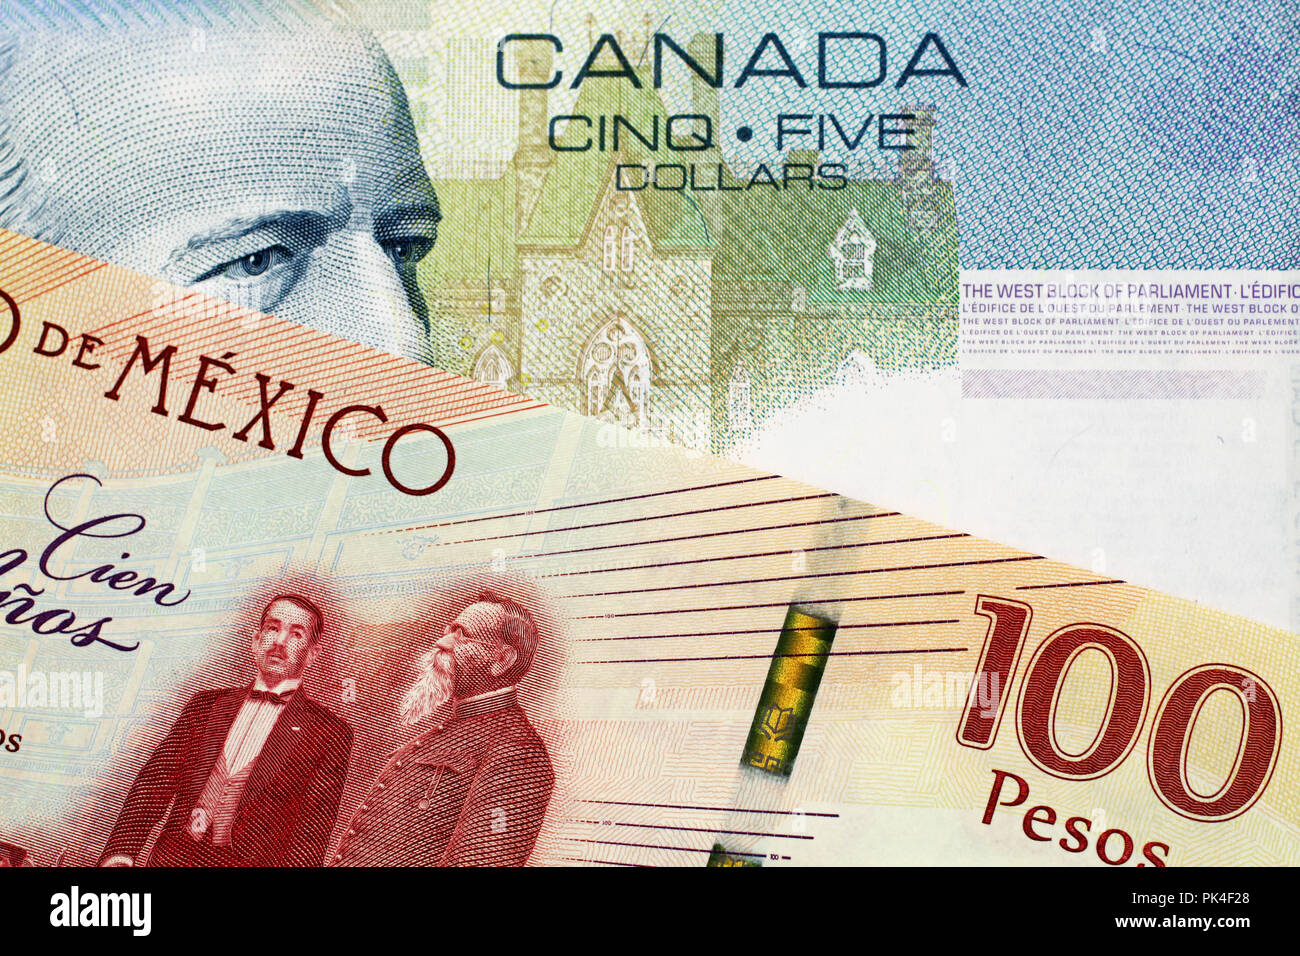 Five Dollar Bank Note Canada Stock Photos & Five Dollar Bank